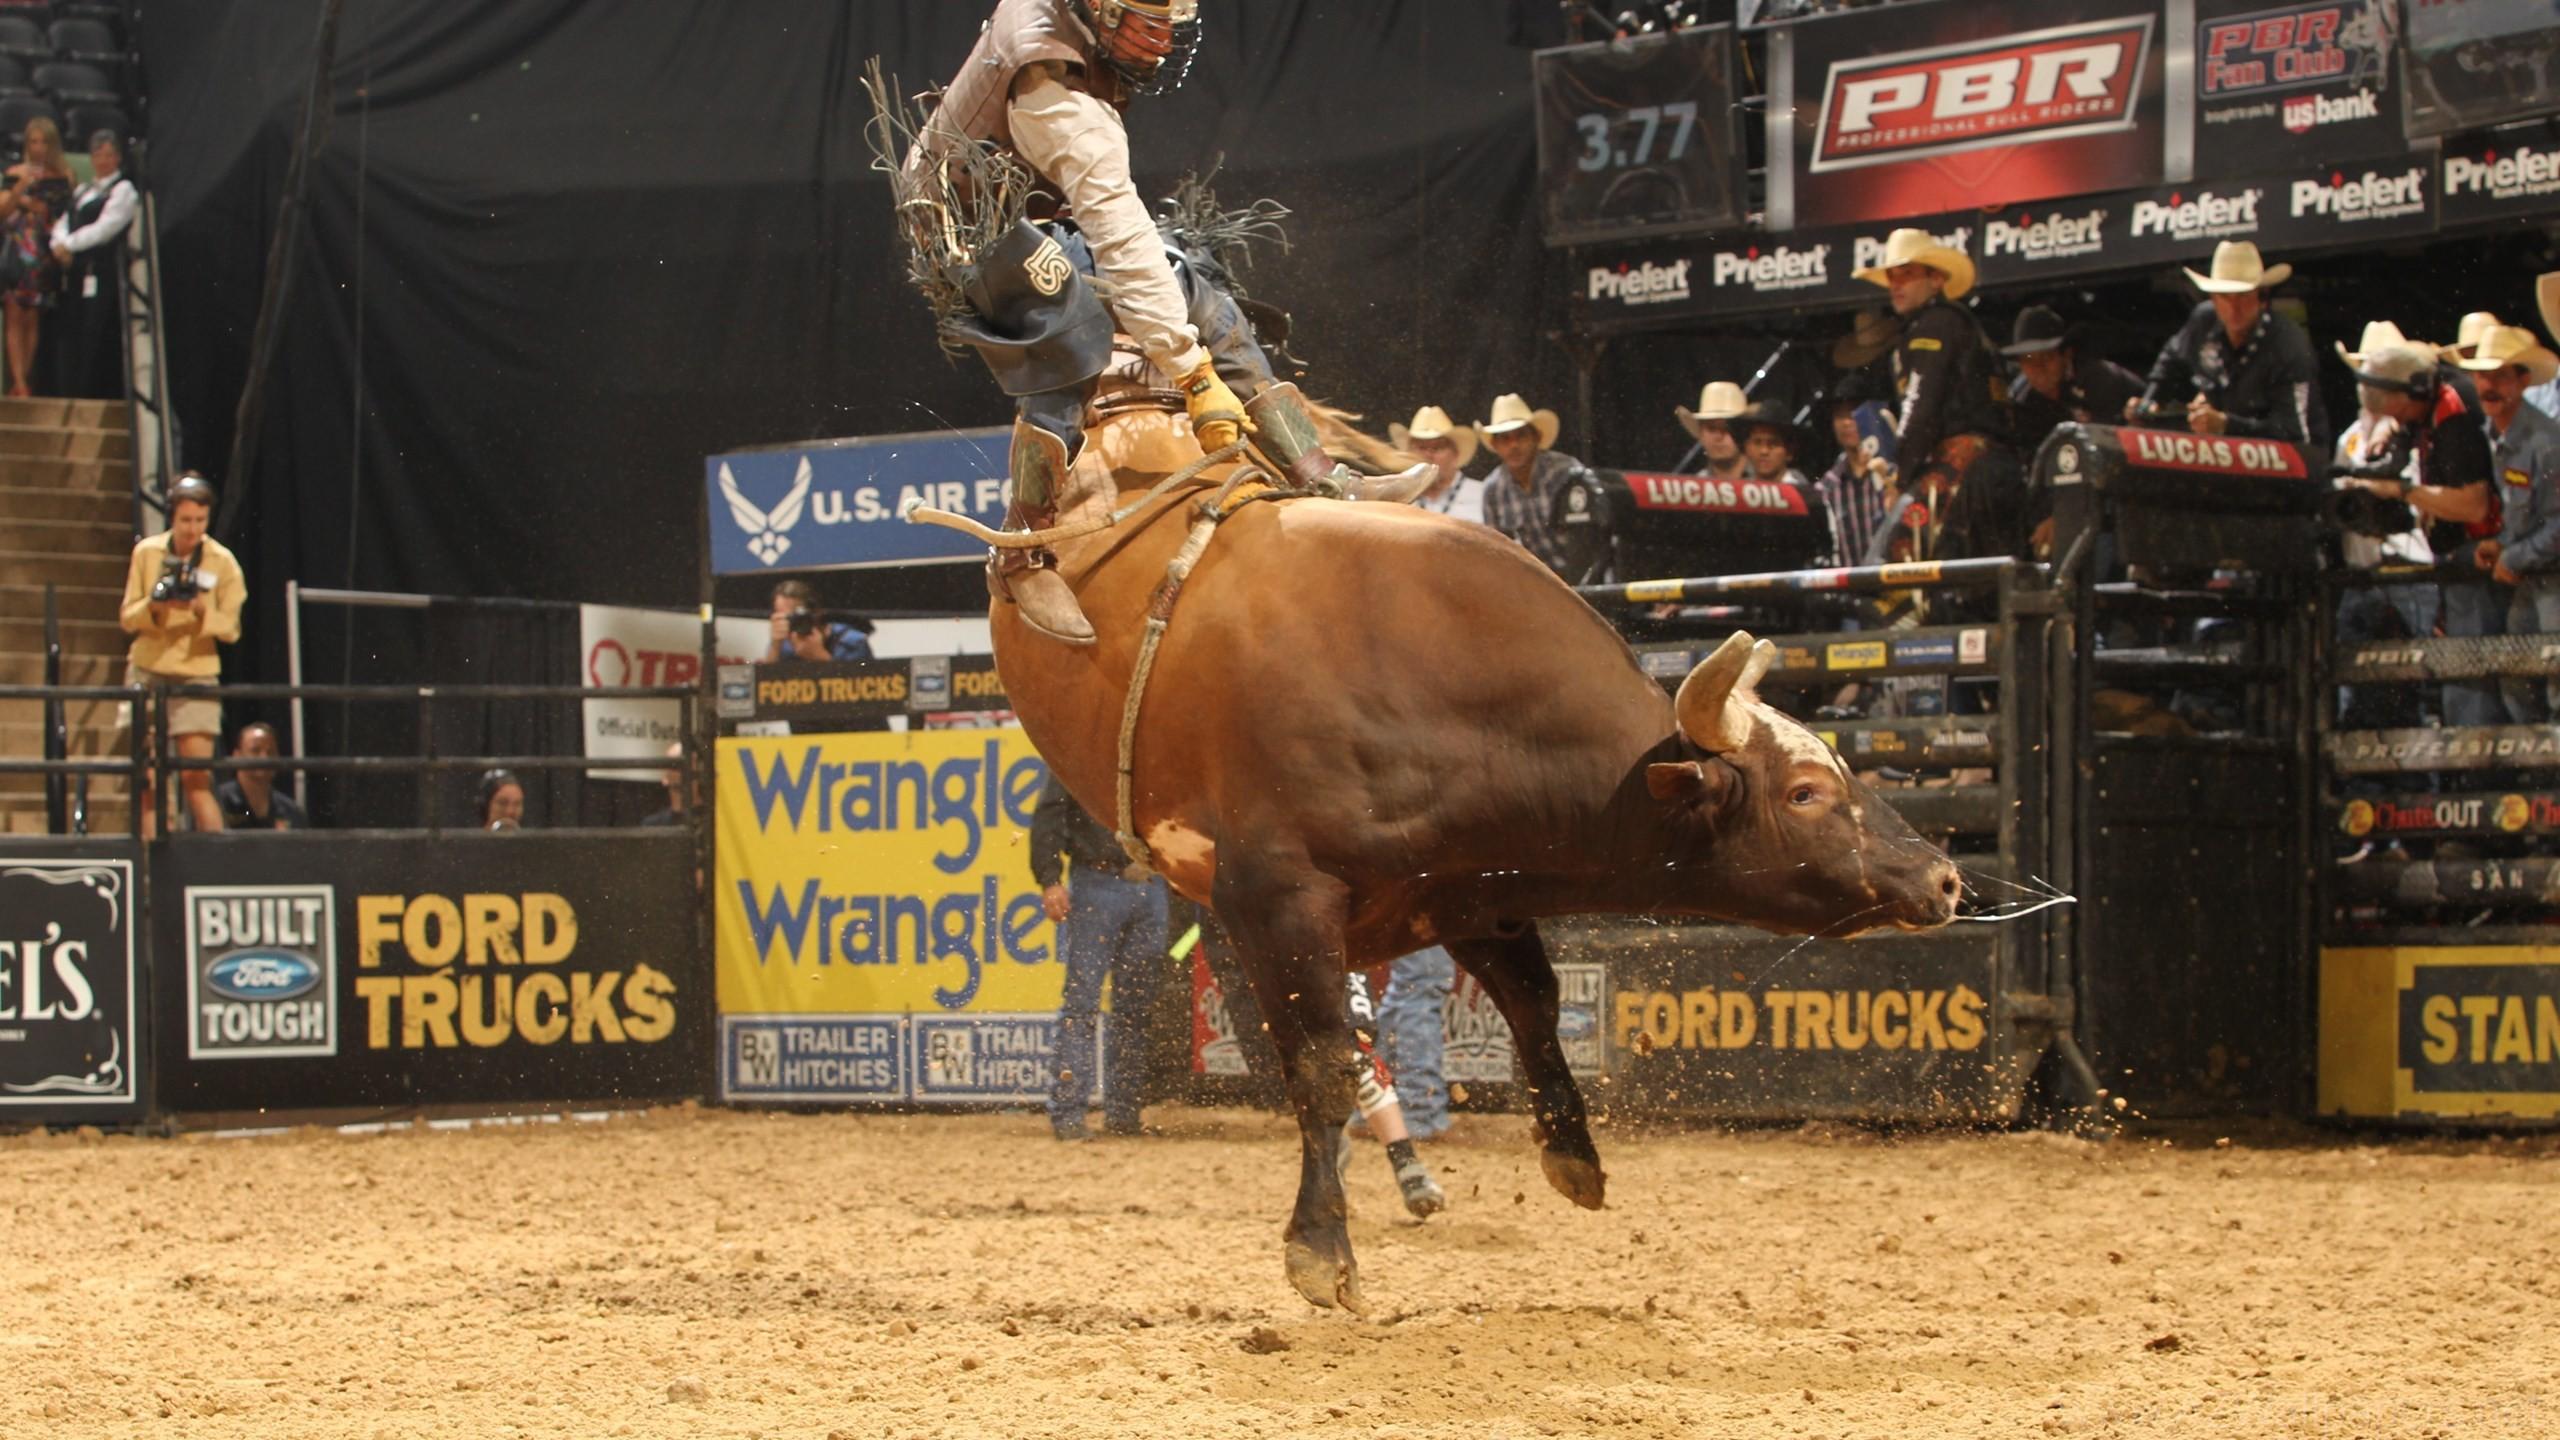 Bull Riding Wallpapers 183 ① Wallpapertag